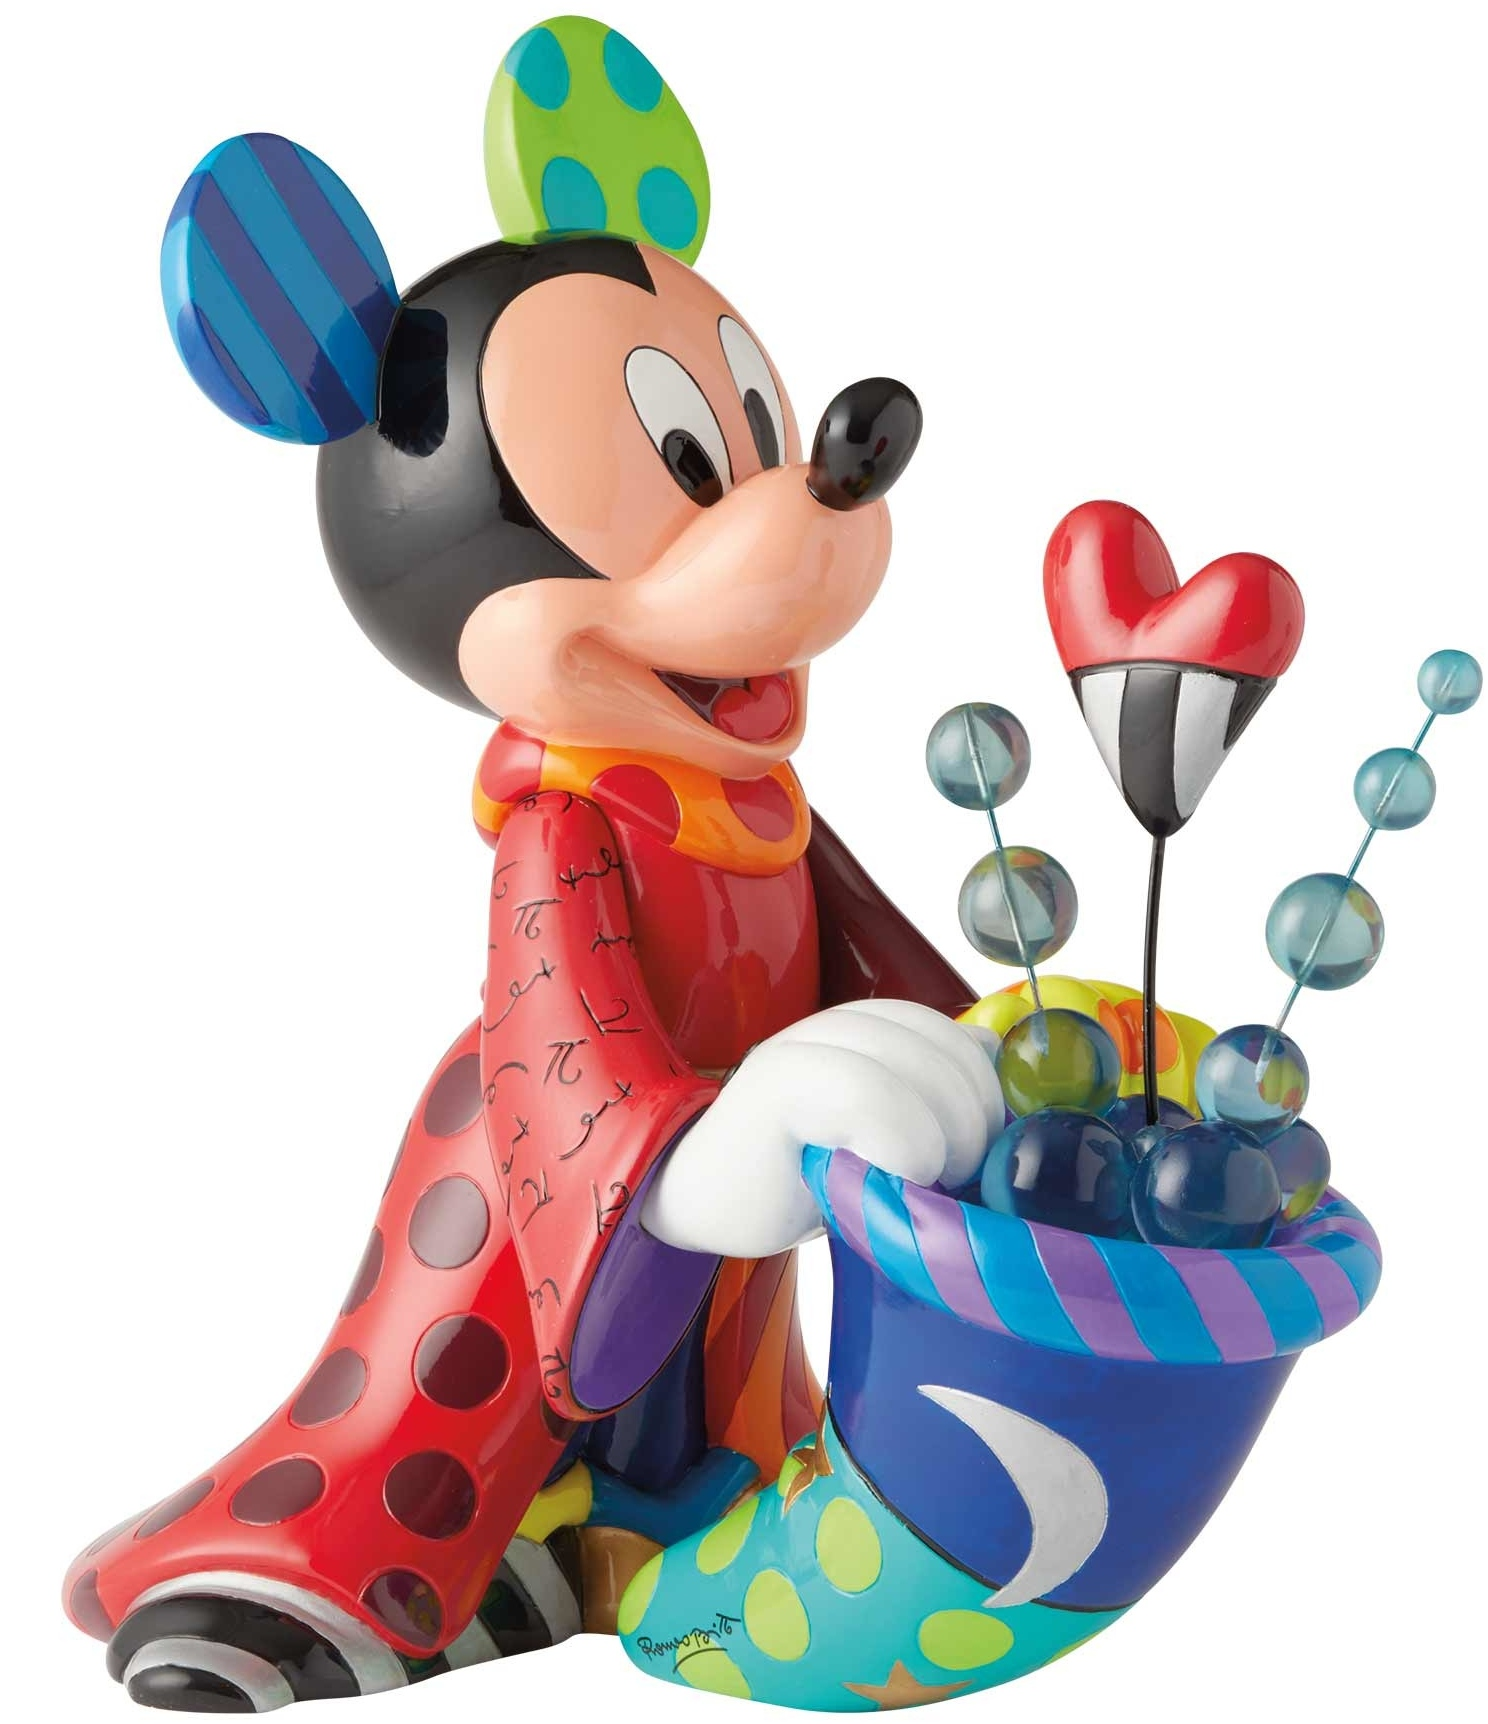 Disney by Britto 6003339 Sorcerer Mickey Big Figurine